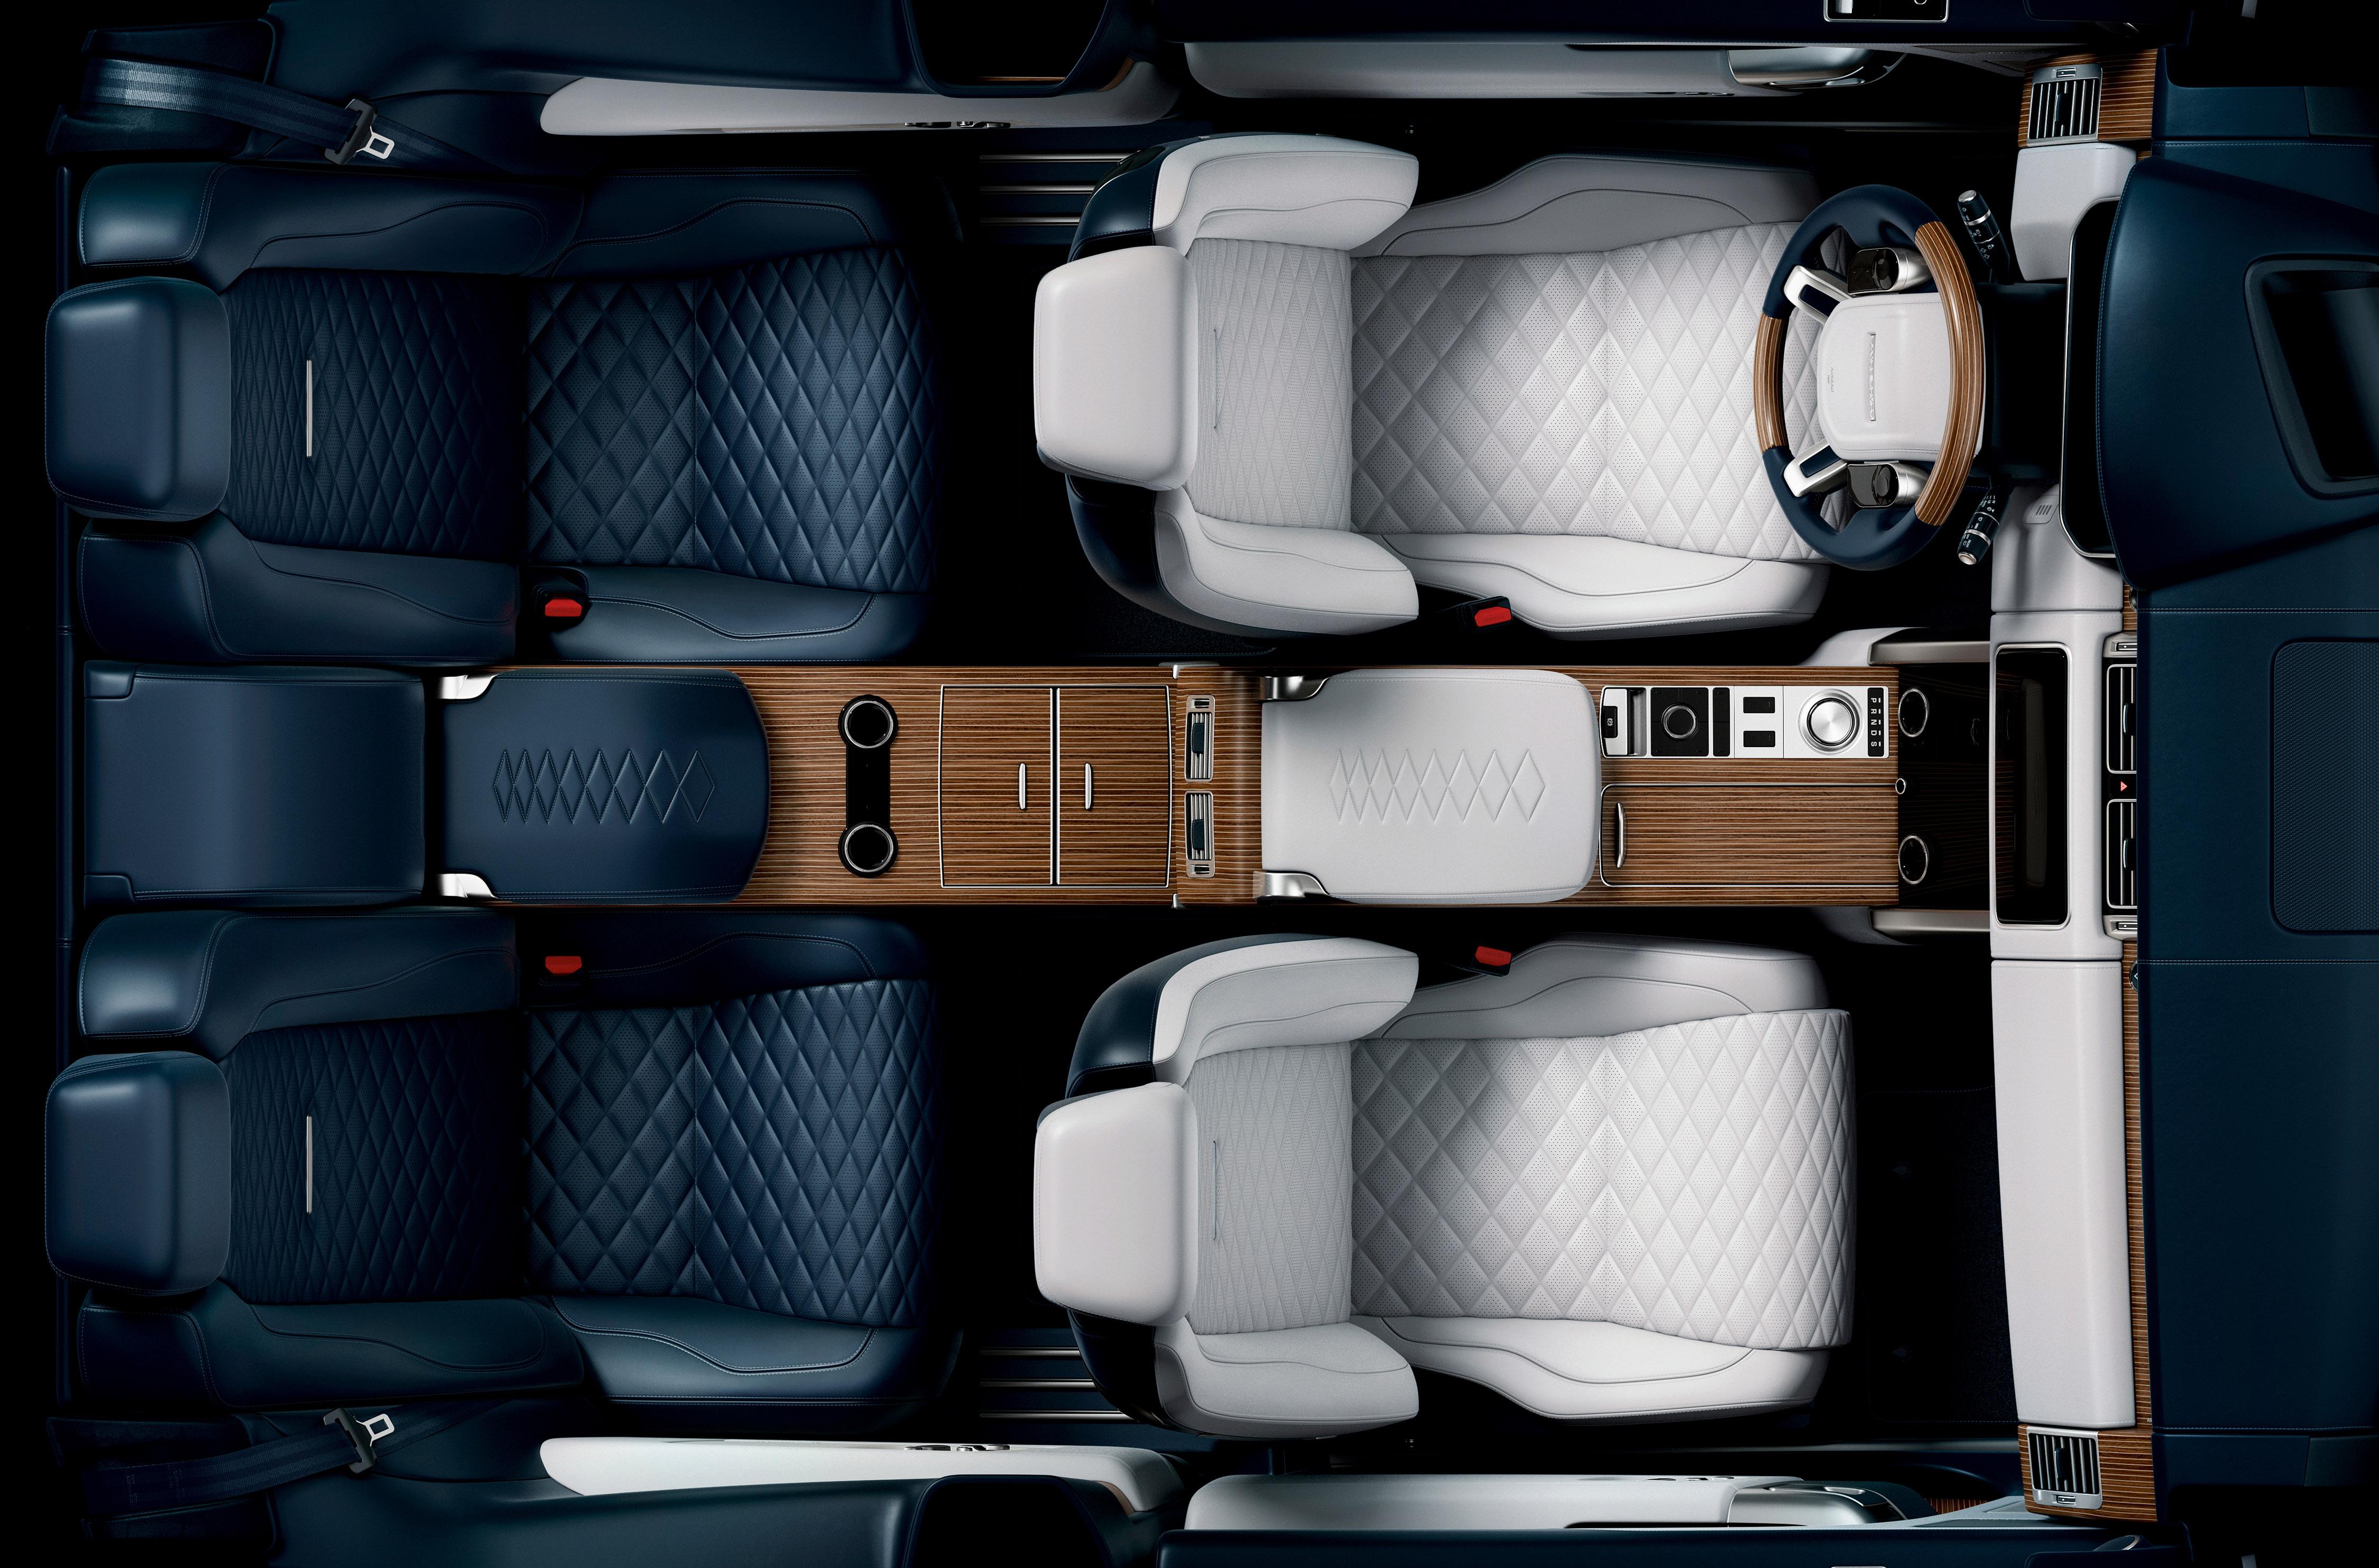 273755 05 range rover sv coupe 99b52a original 1519909283